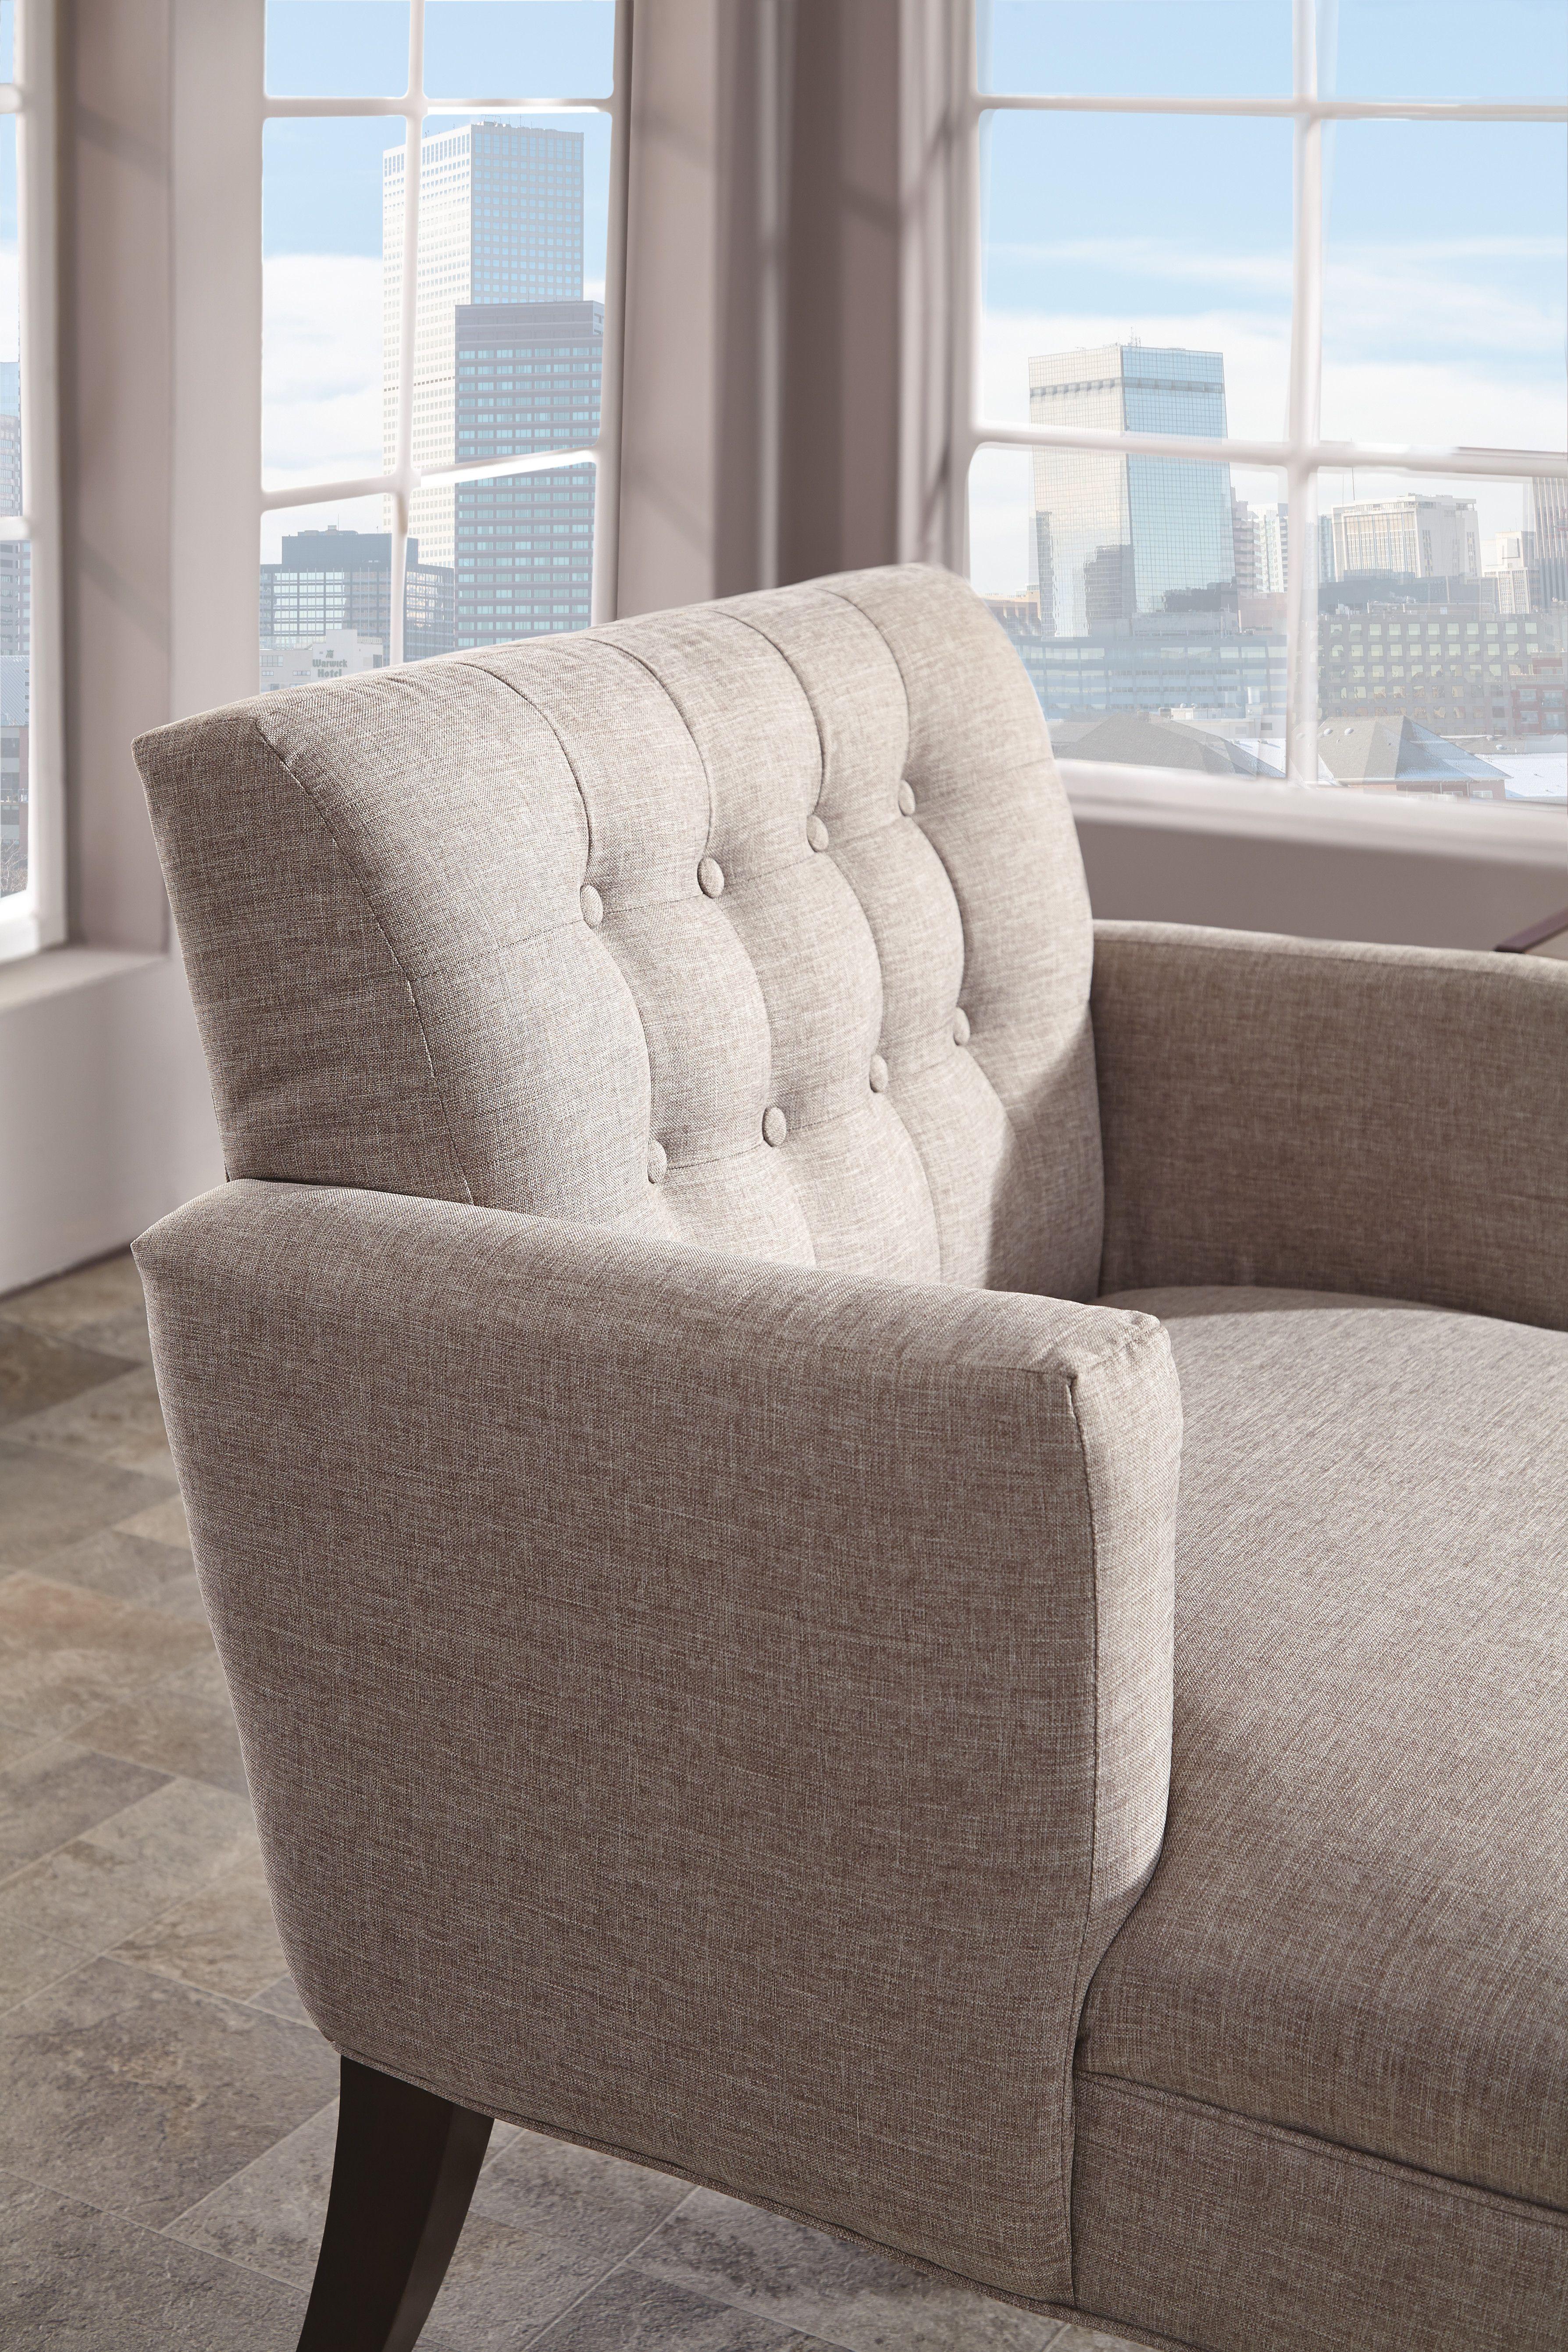 Premium style and impeccable design define this chair Crisp